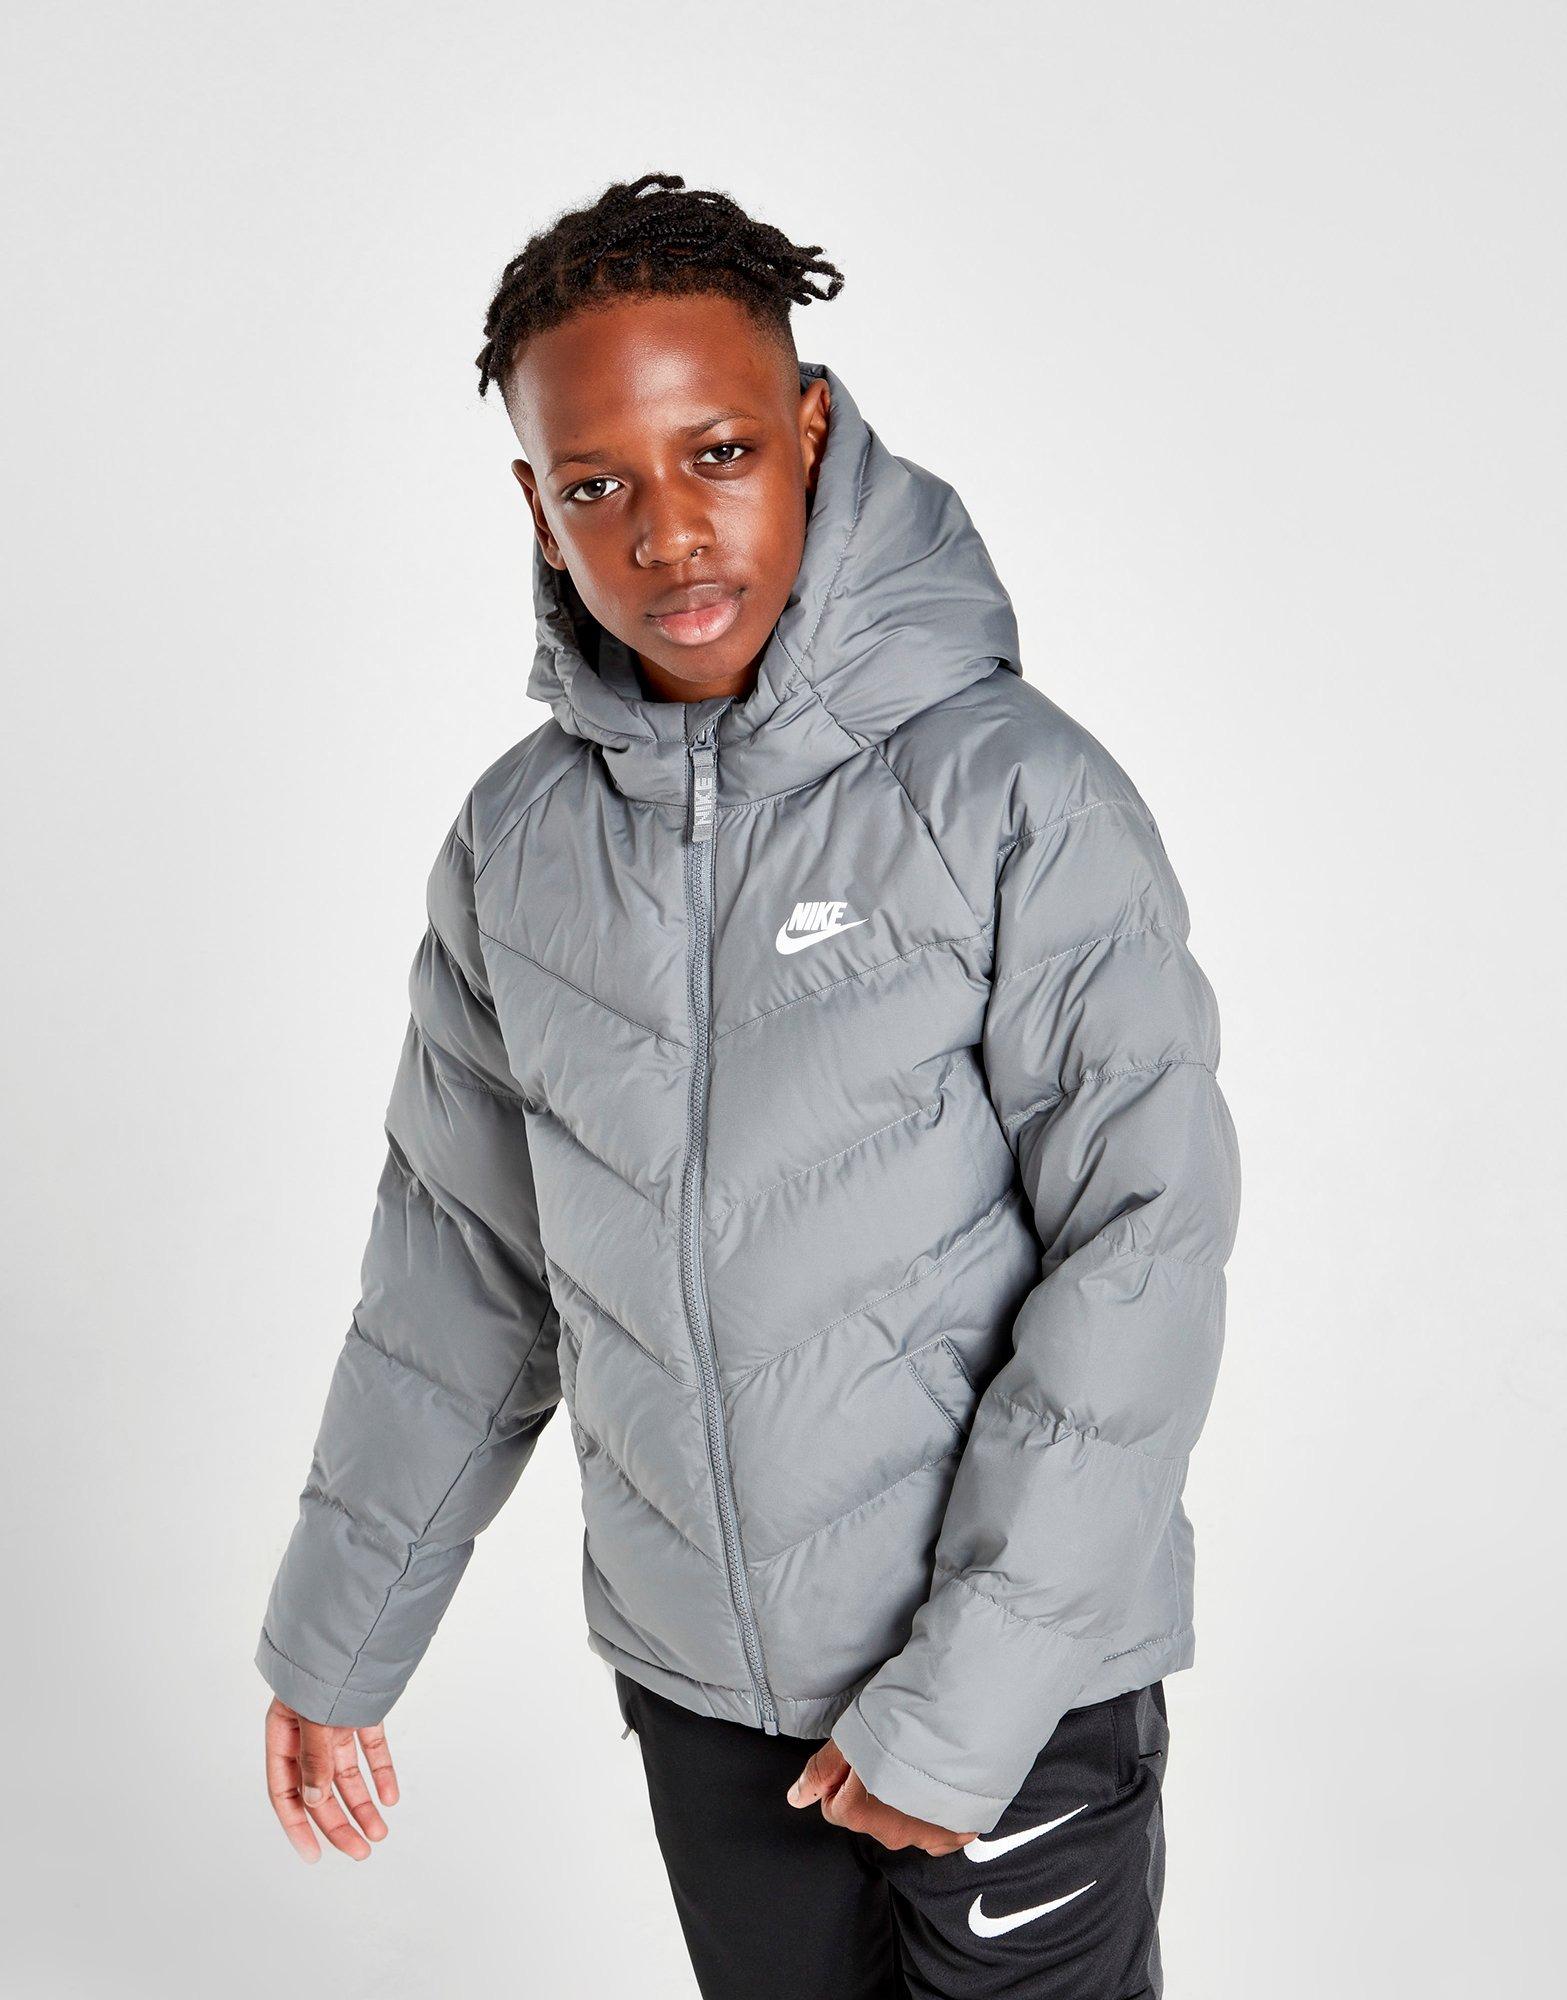 Tiranía mariposa Vegetales  White Nike Sportswear Padded Jacket Junior | JD Sports